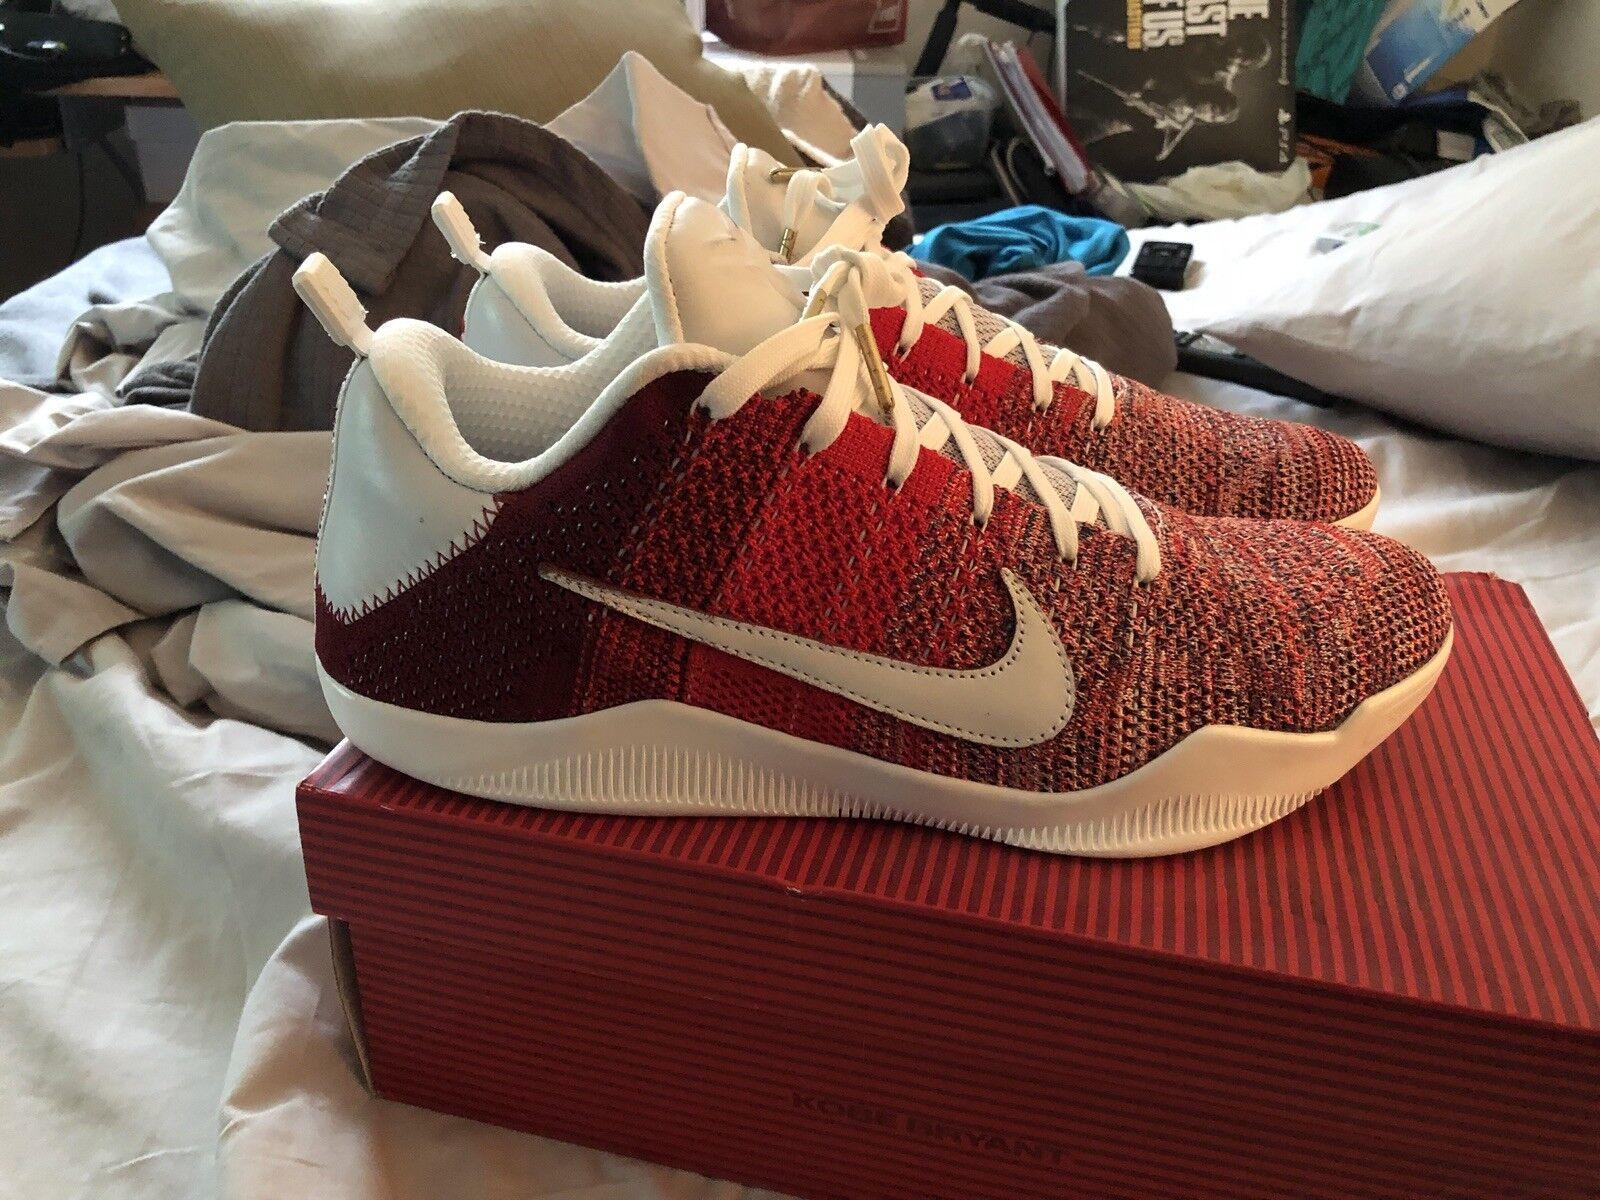 Nike Kobe XI Elite baja rojo 4KB talla caballo rojo baja fa8b57